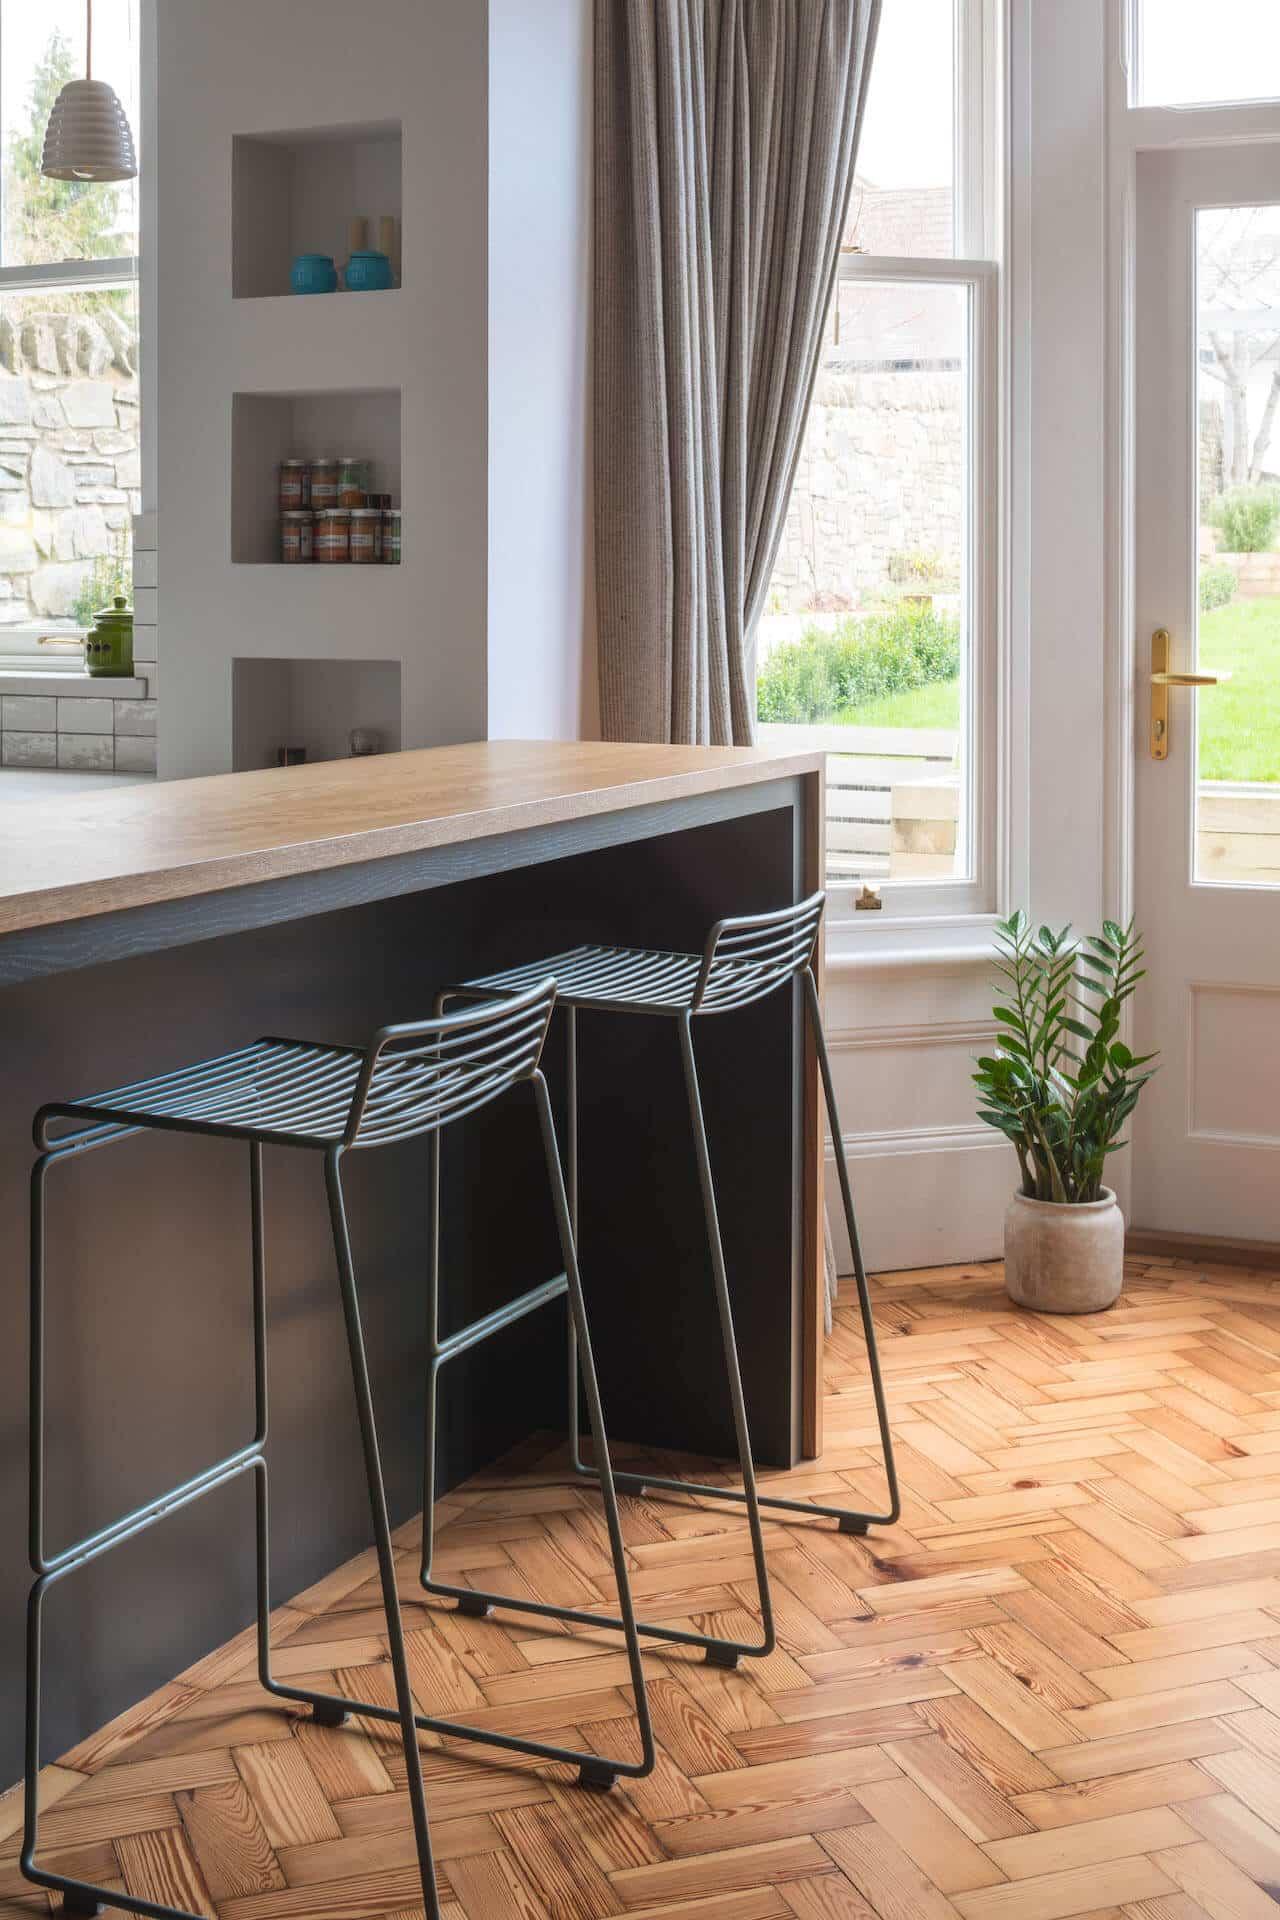 The Cardiff Green Shaker Kitchen with Oak breckfast bar peninsular